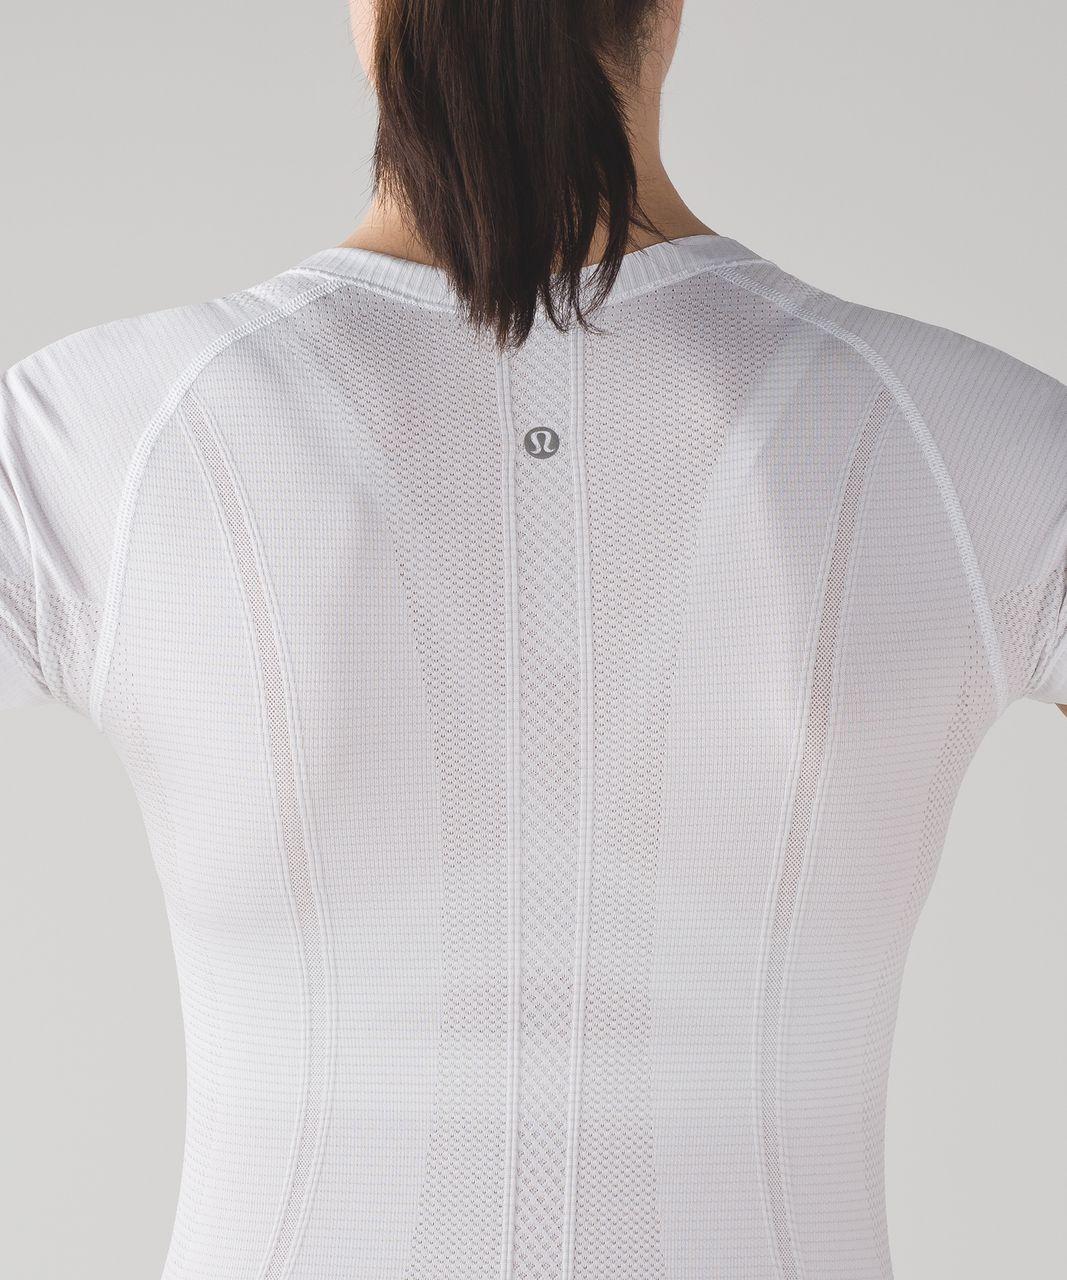 Lululemon Swiftly Tech Short Sleeve Crew - White / White